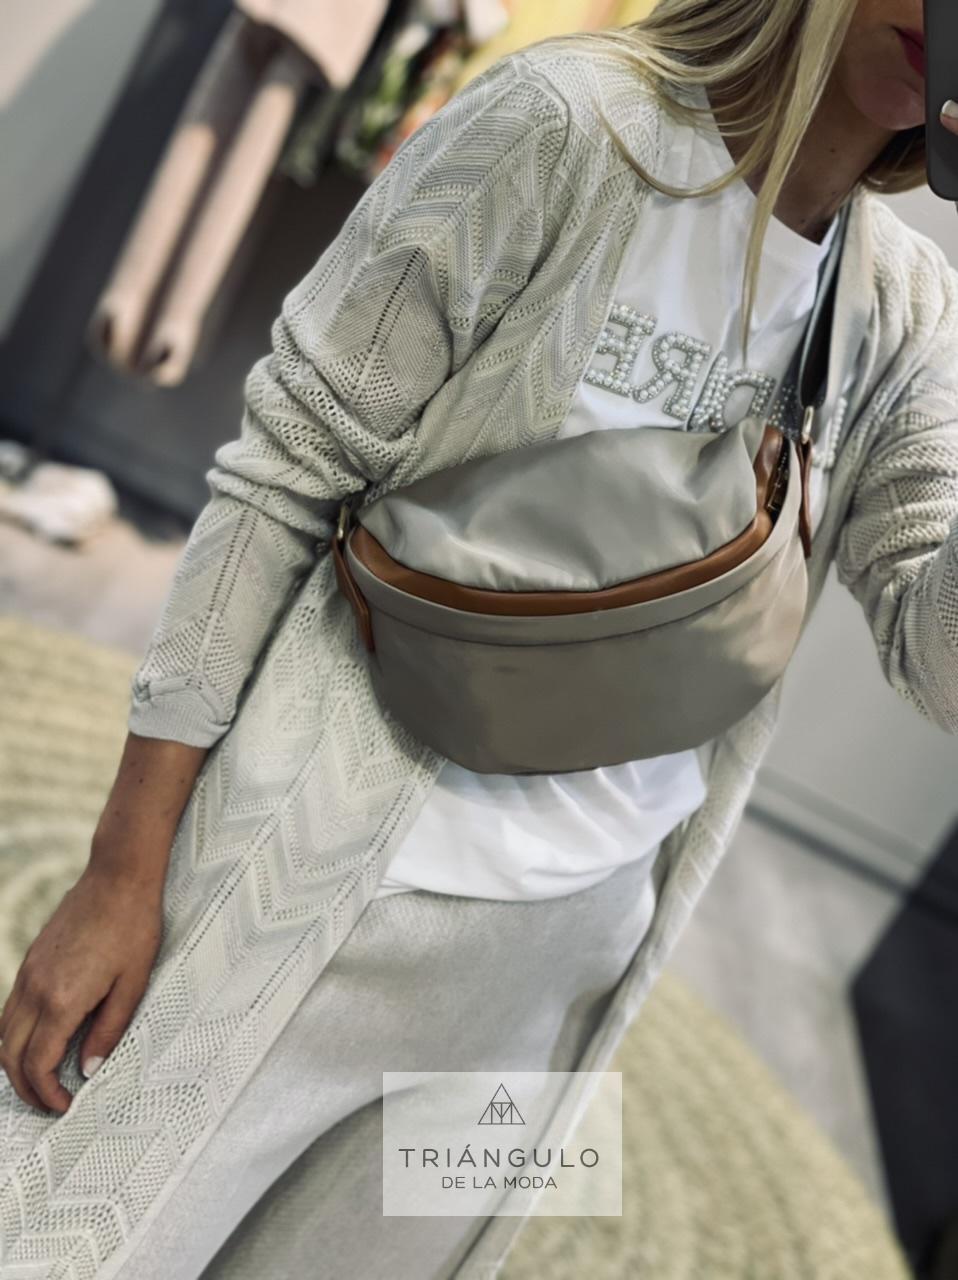 Tienda online del Triangulo de la Moda Riñonera nylon